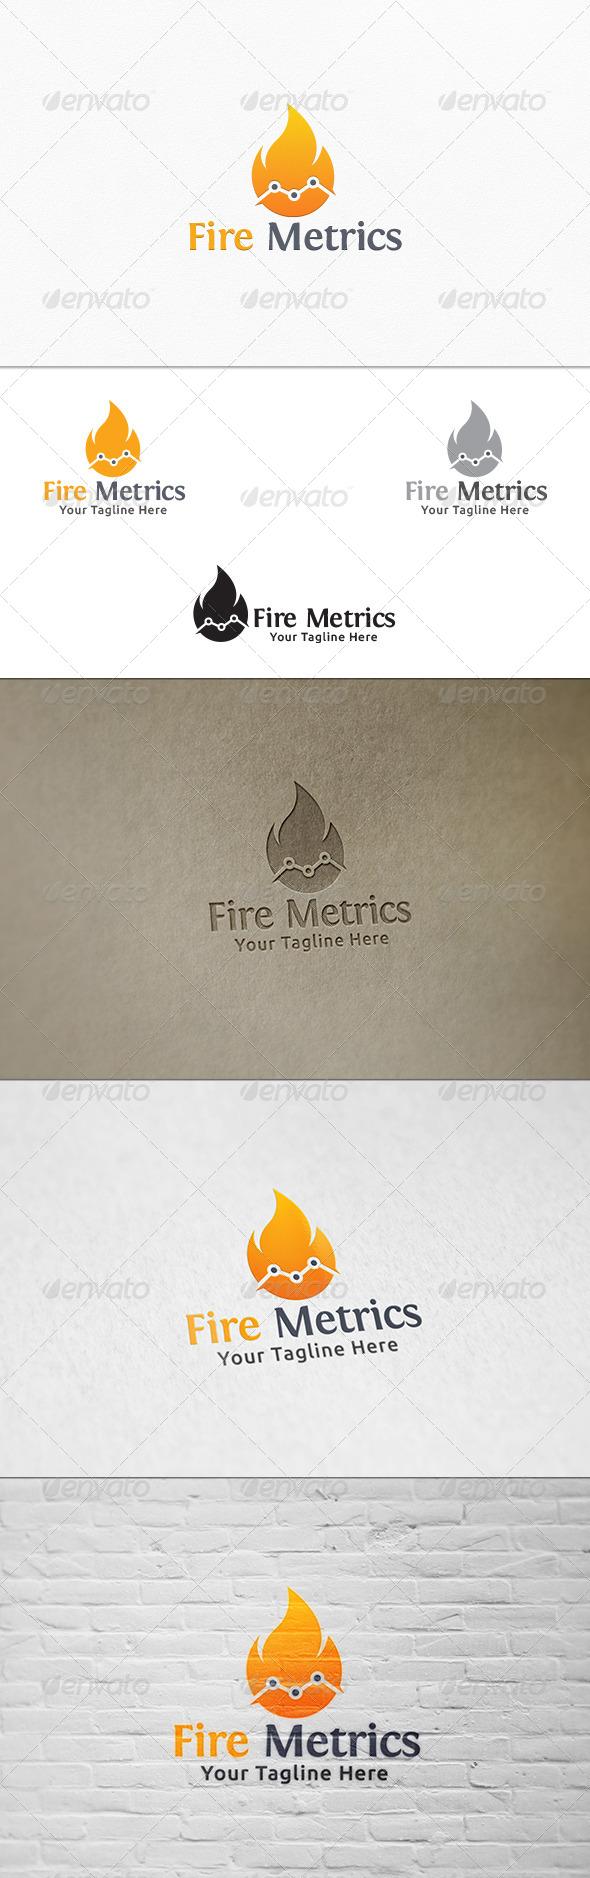 GraphicRiver Fire Metrics Logo Template 7609062